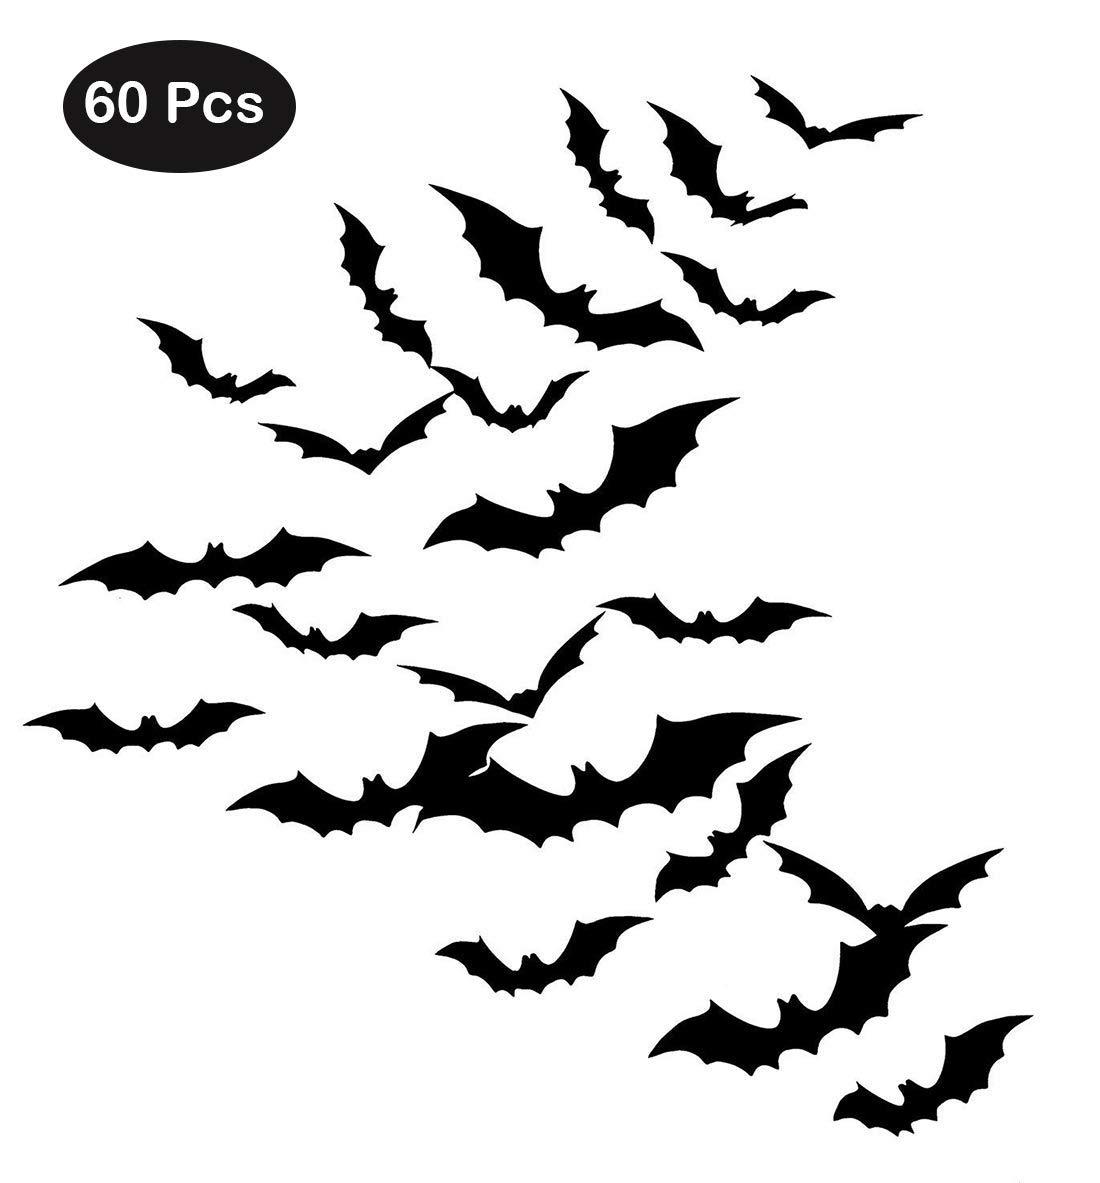 Zilbery 60 Pcs Halloween 3D Bats Halloween Party Supplies for Home Window Wall Decoration (Black)